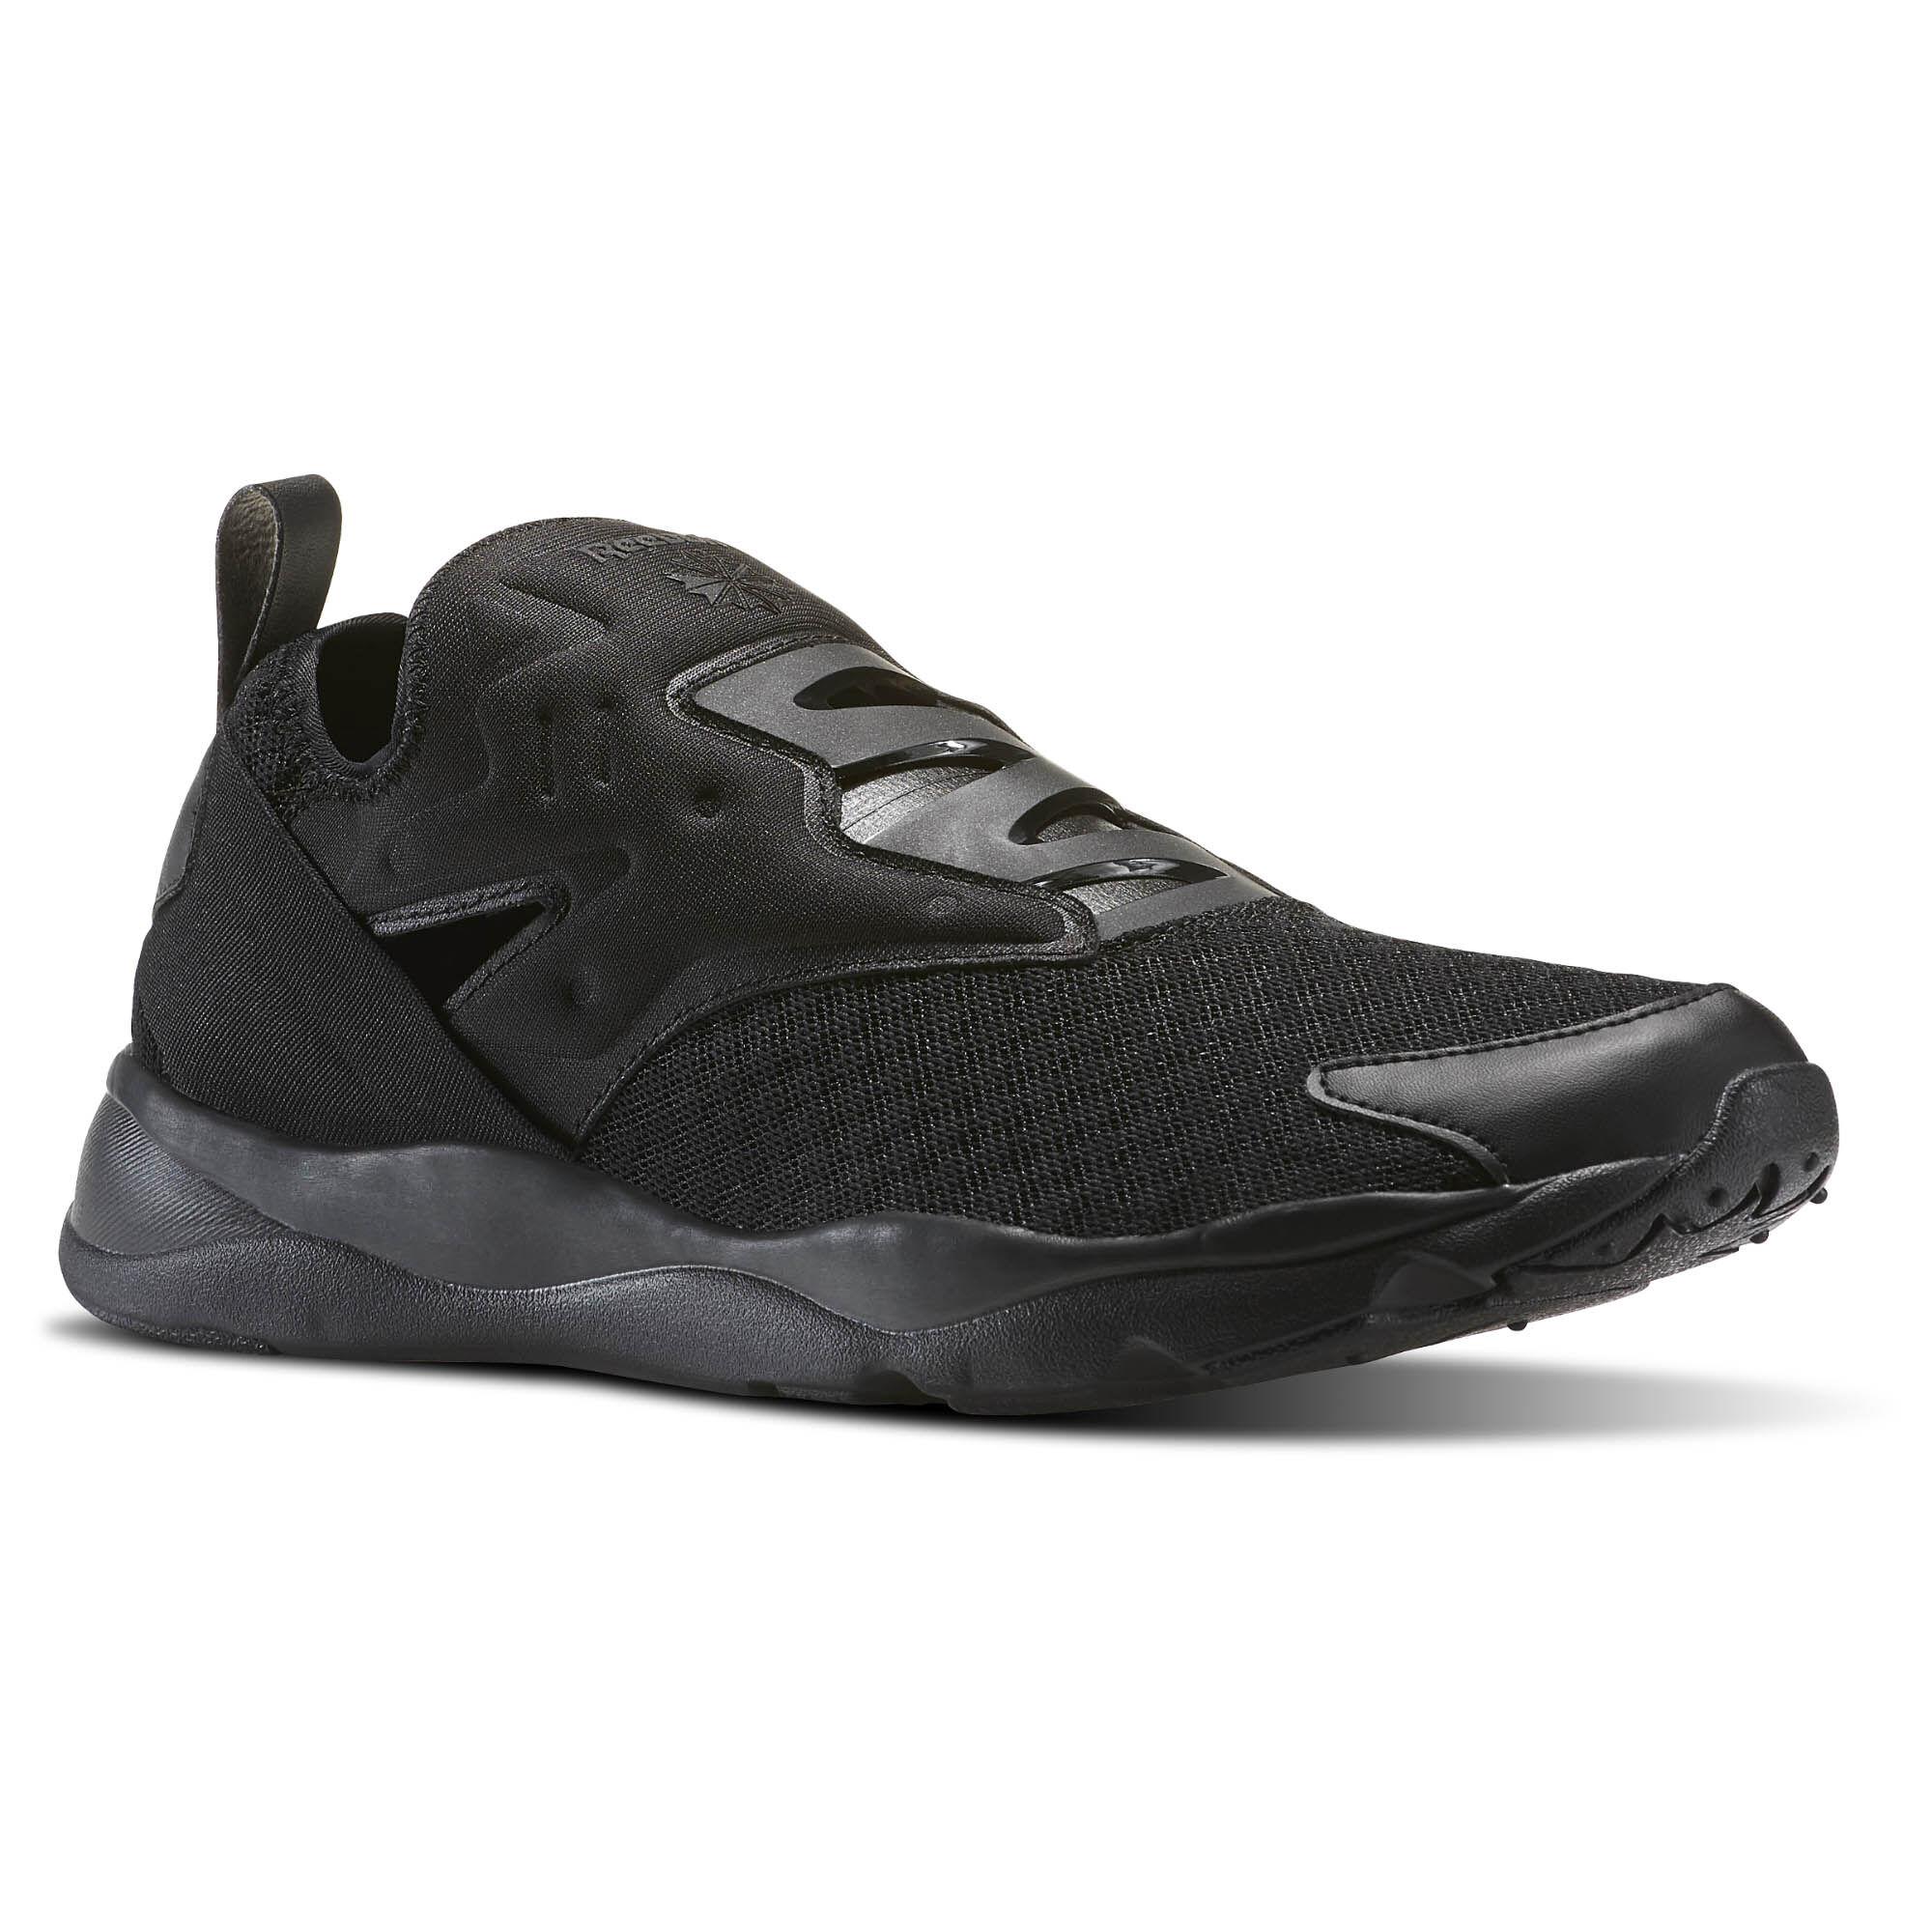 712aa6b0467965 reebok reebok fury lite men sneakers all black  reebok furylite slip on emb black  white bd1724